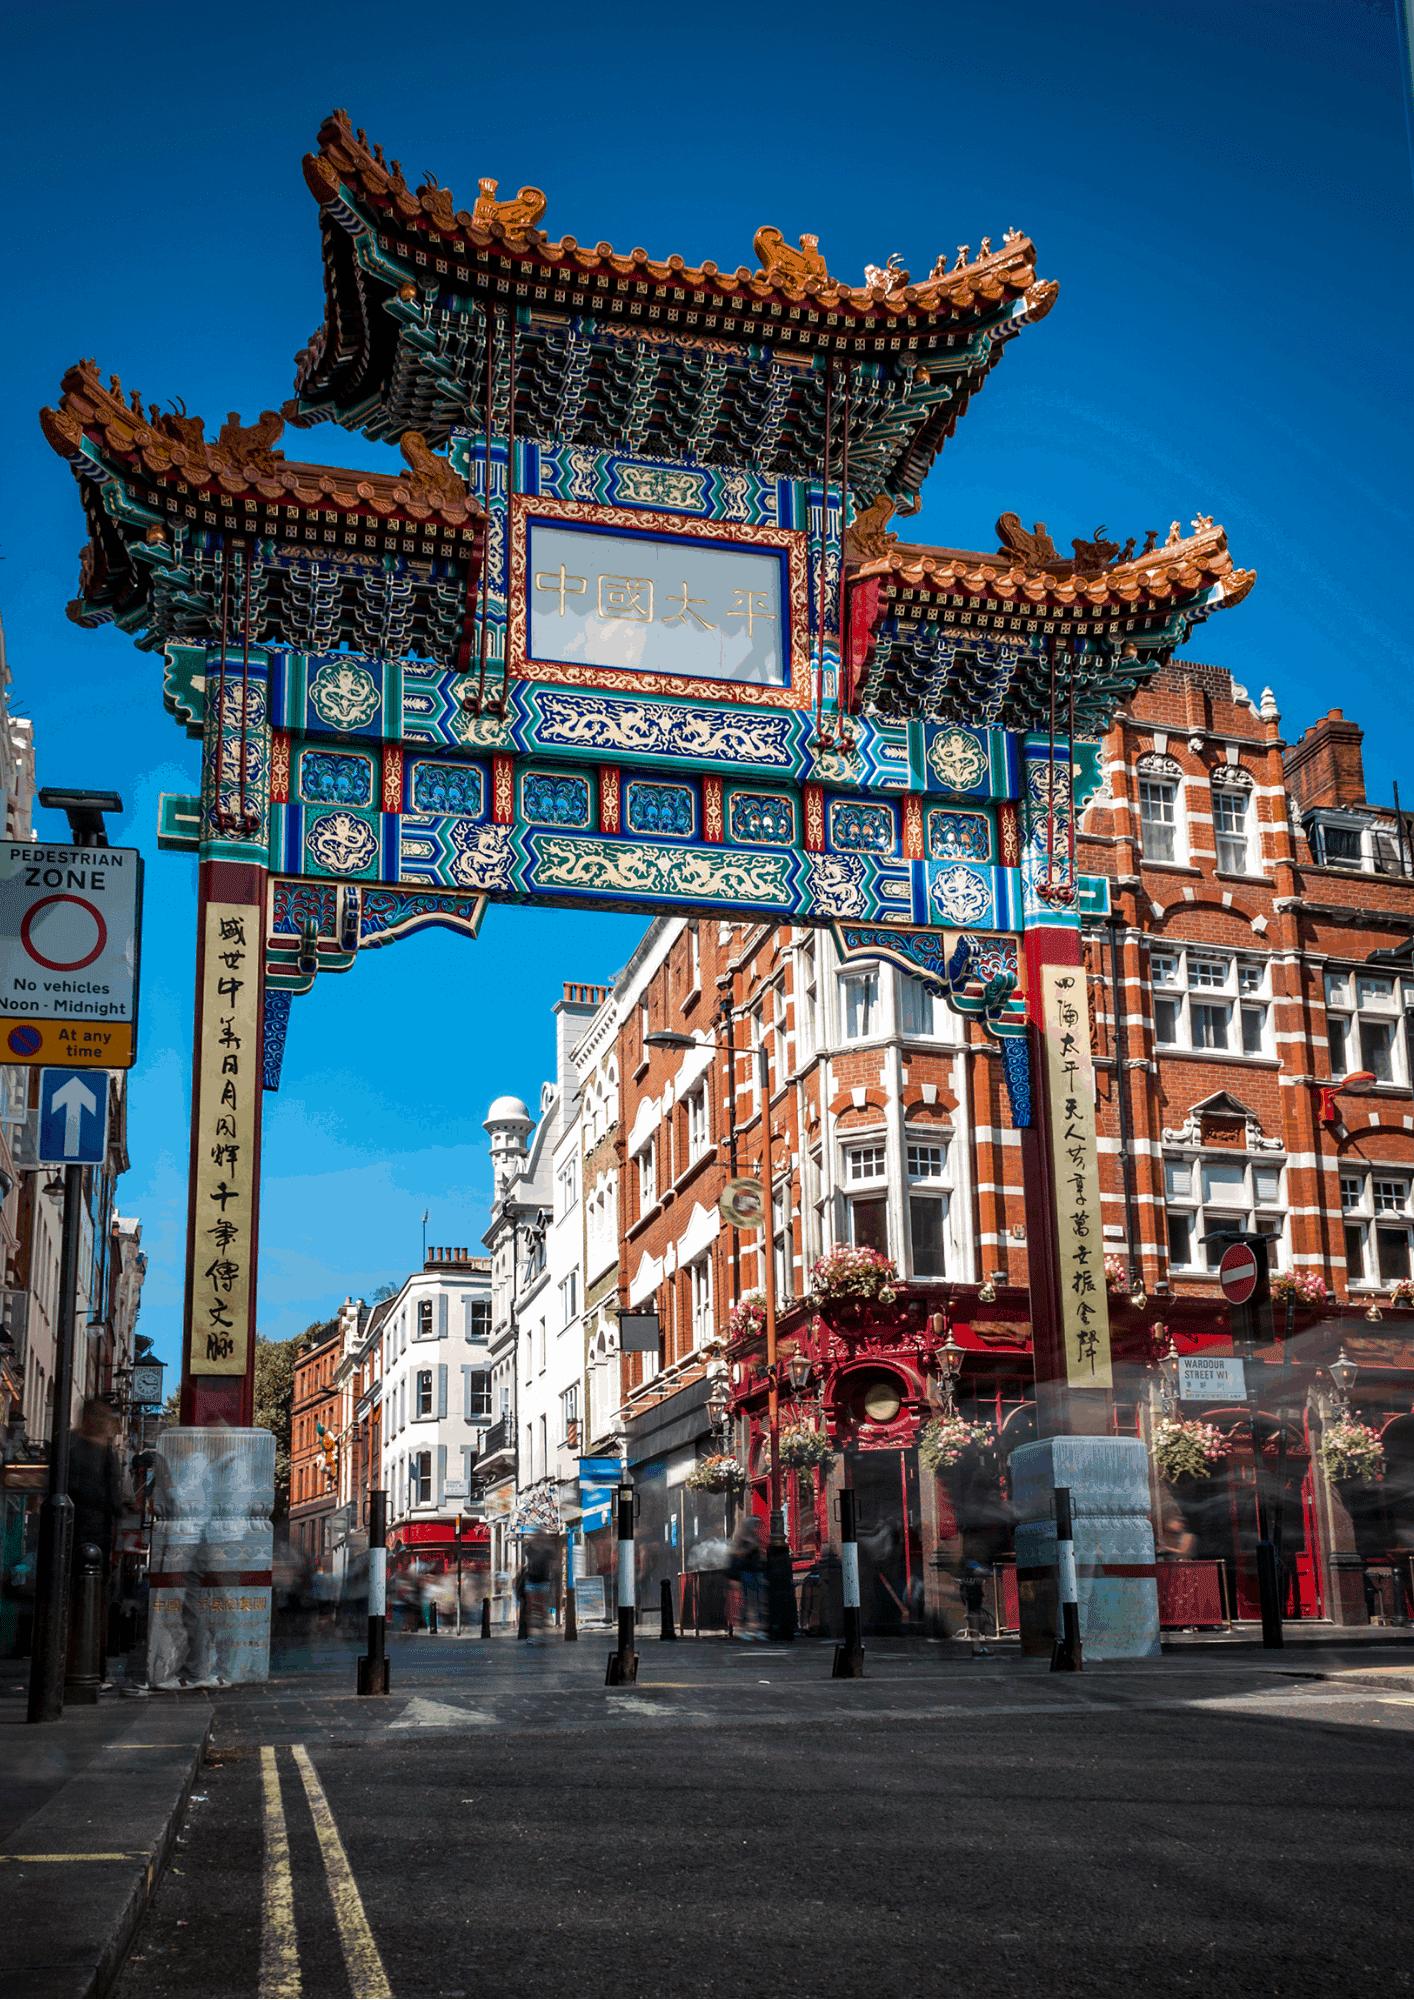 Chinatown Gate Chinatown London